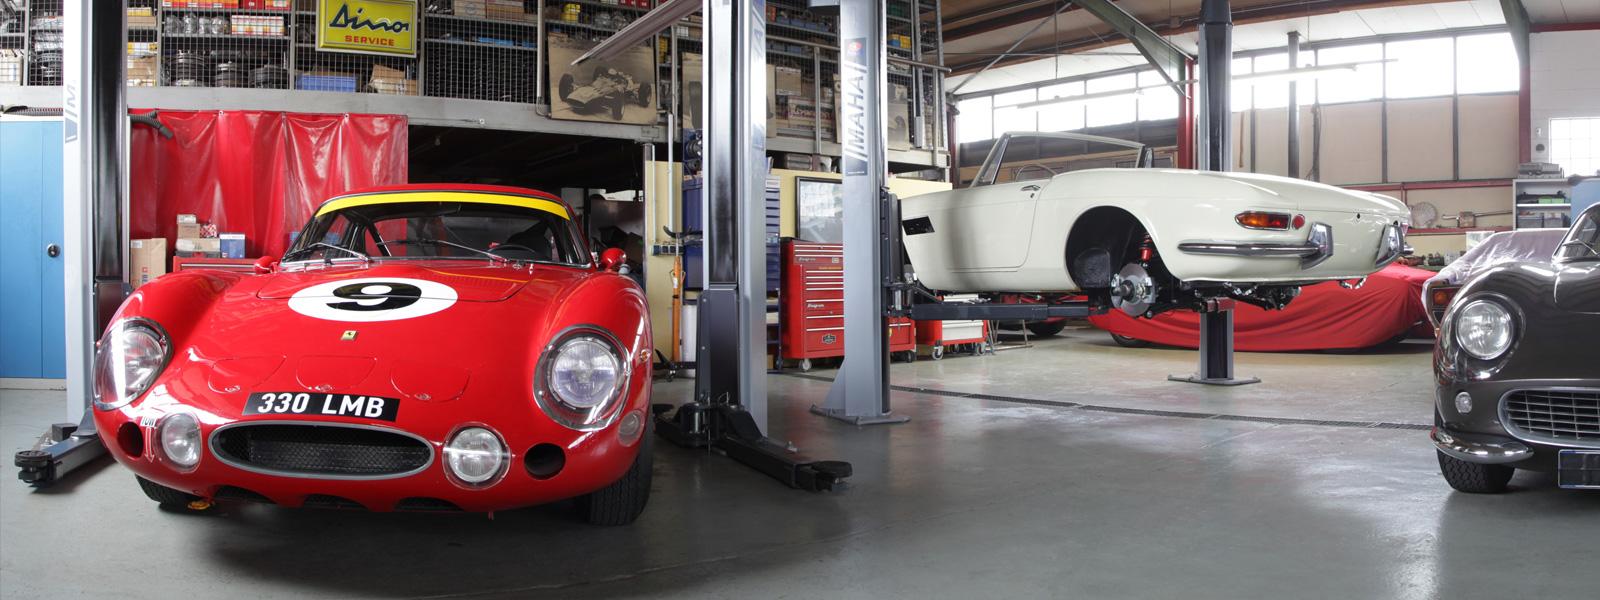 Modena Motorsport Service Restoration Modena Motorsport